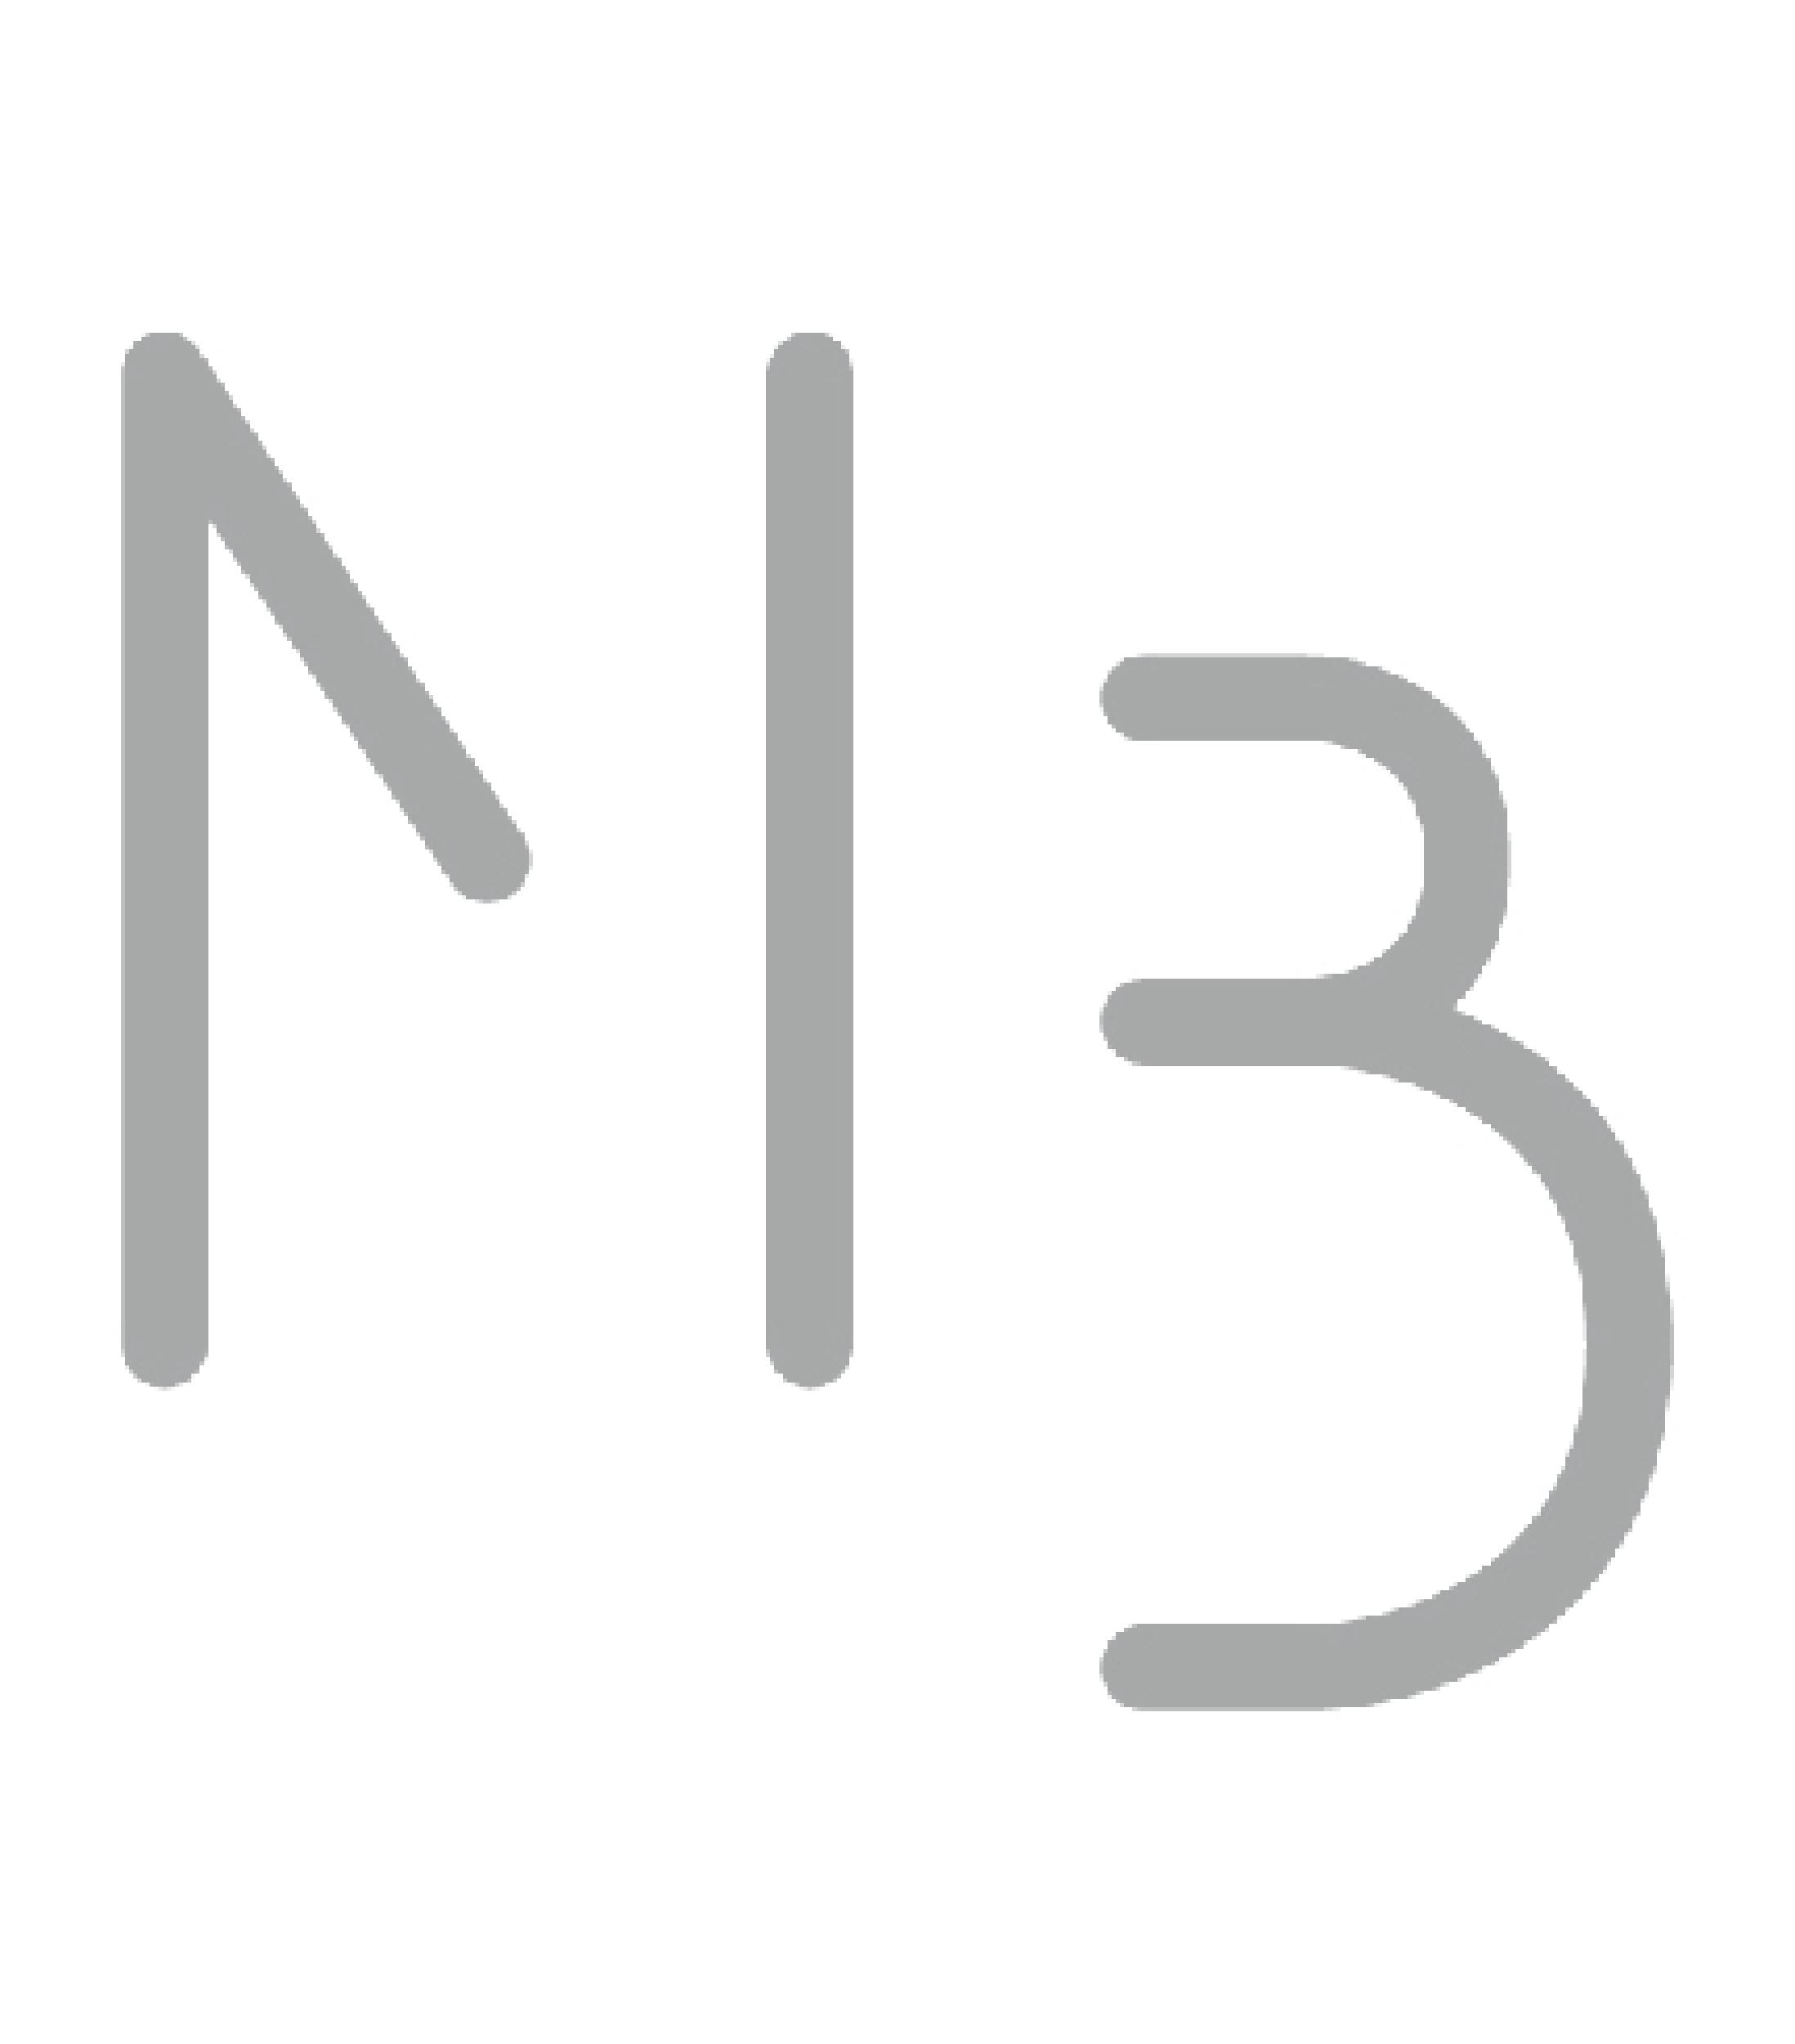 Manex Bilbao | Product Designer